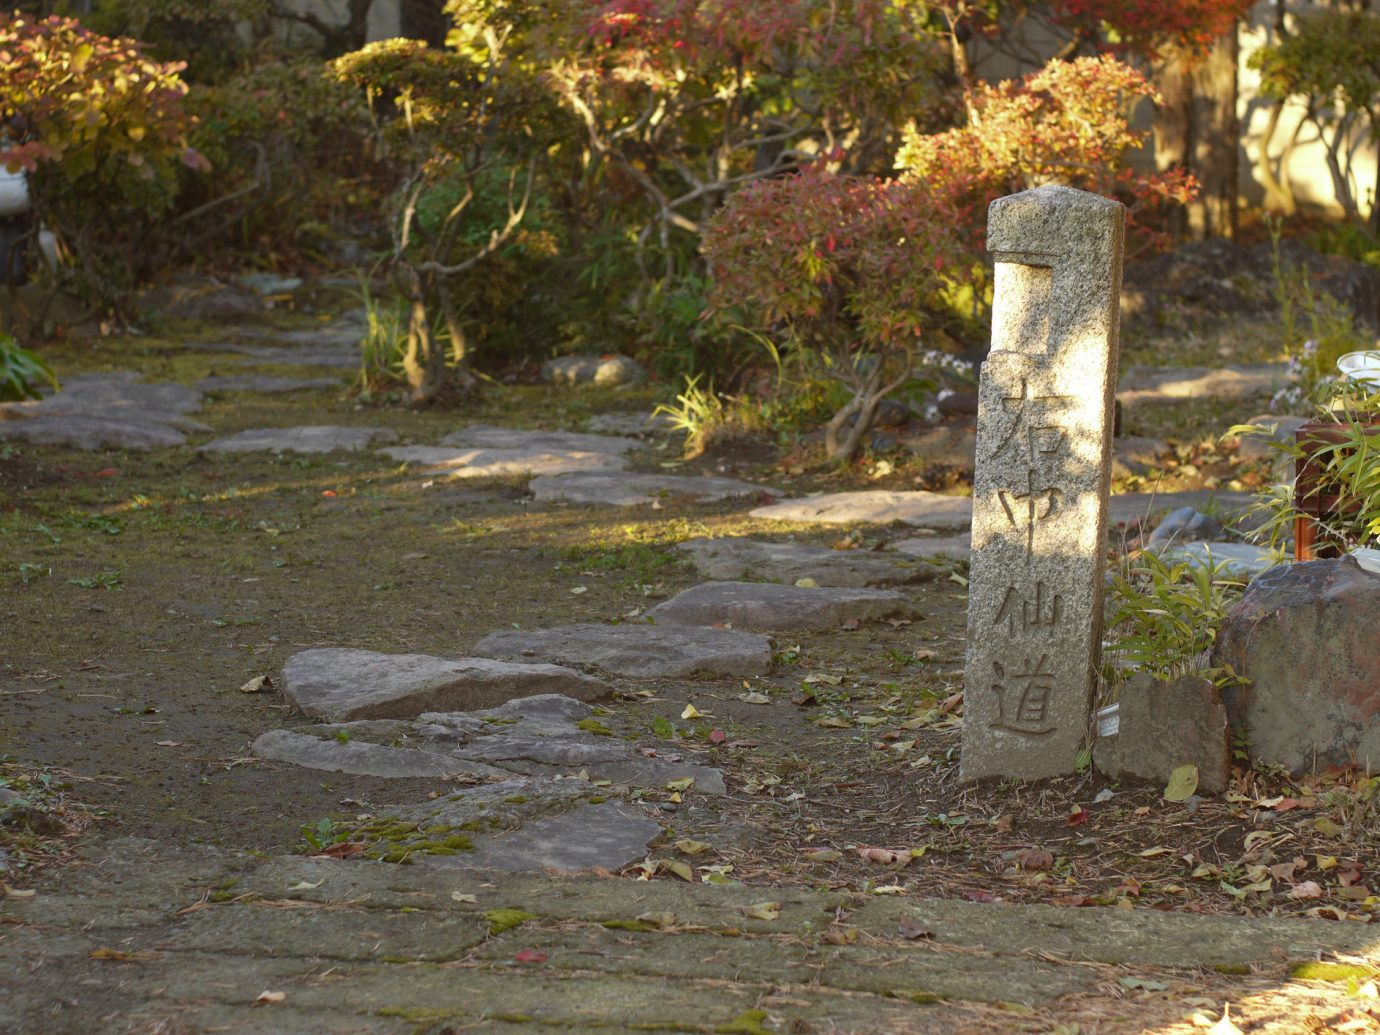 Trip Ideas outdoor tree ground grass season autumn leaf woodland Garden curb